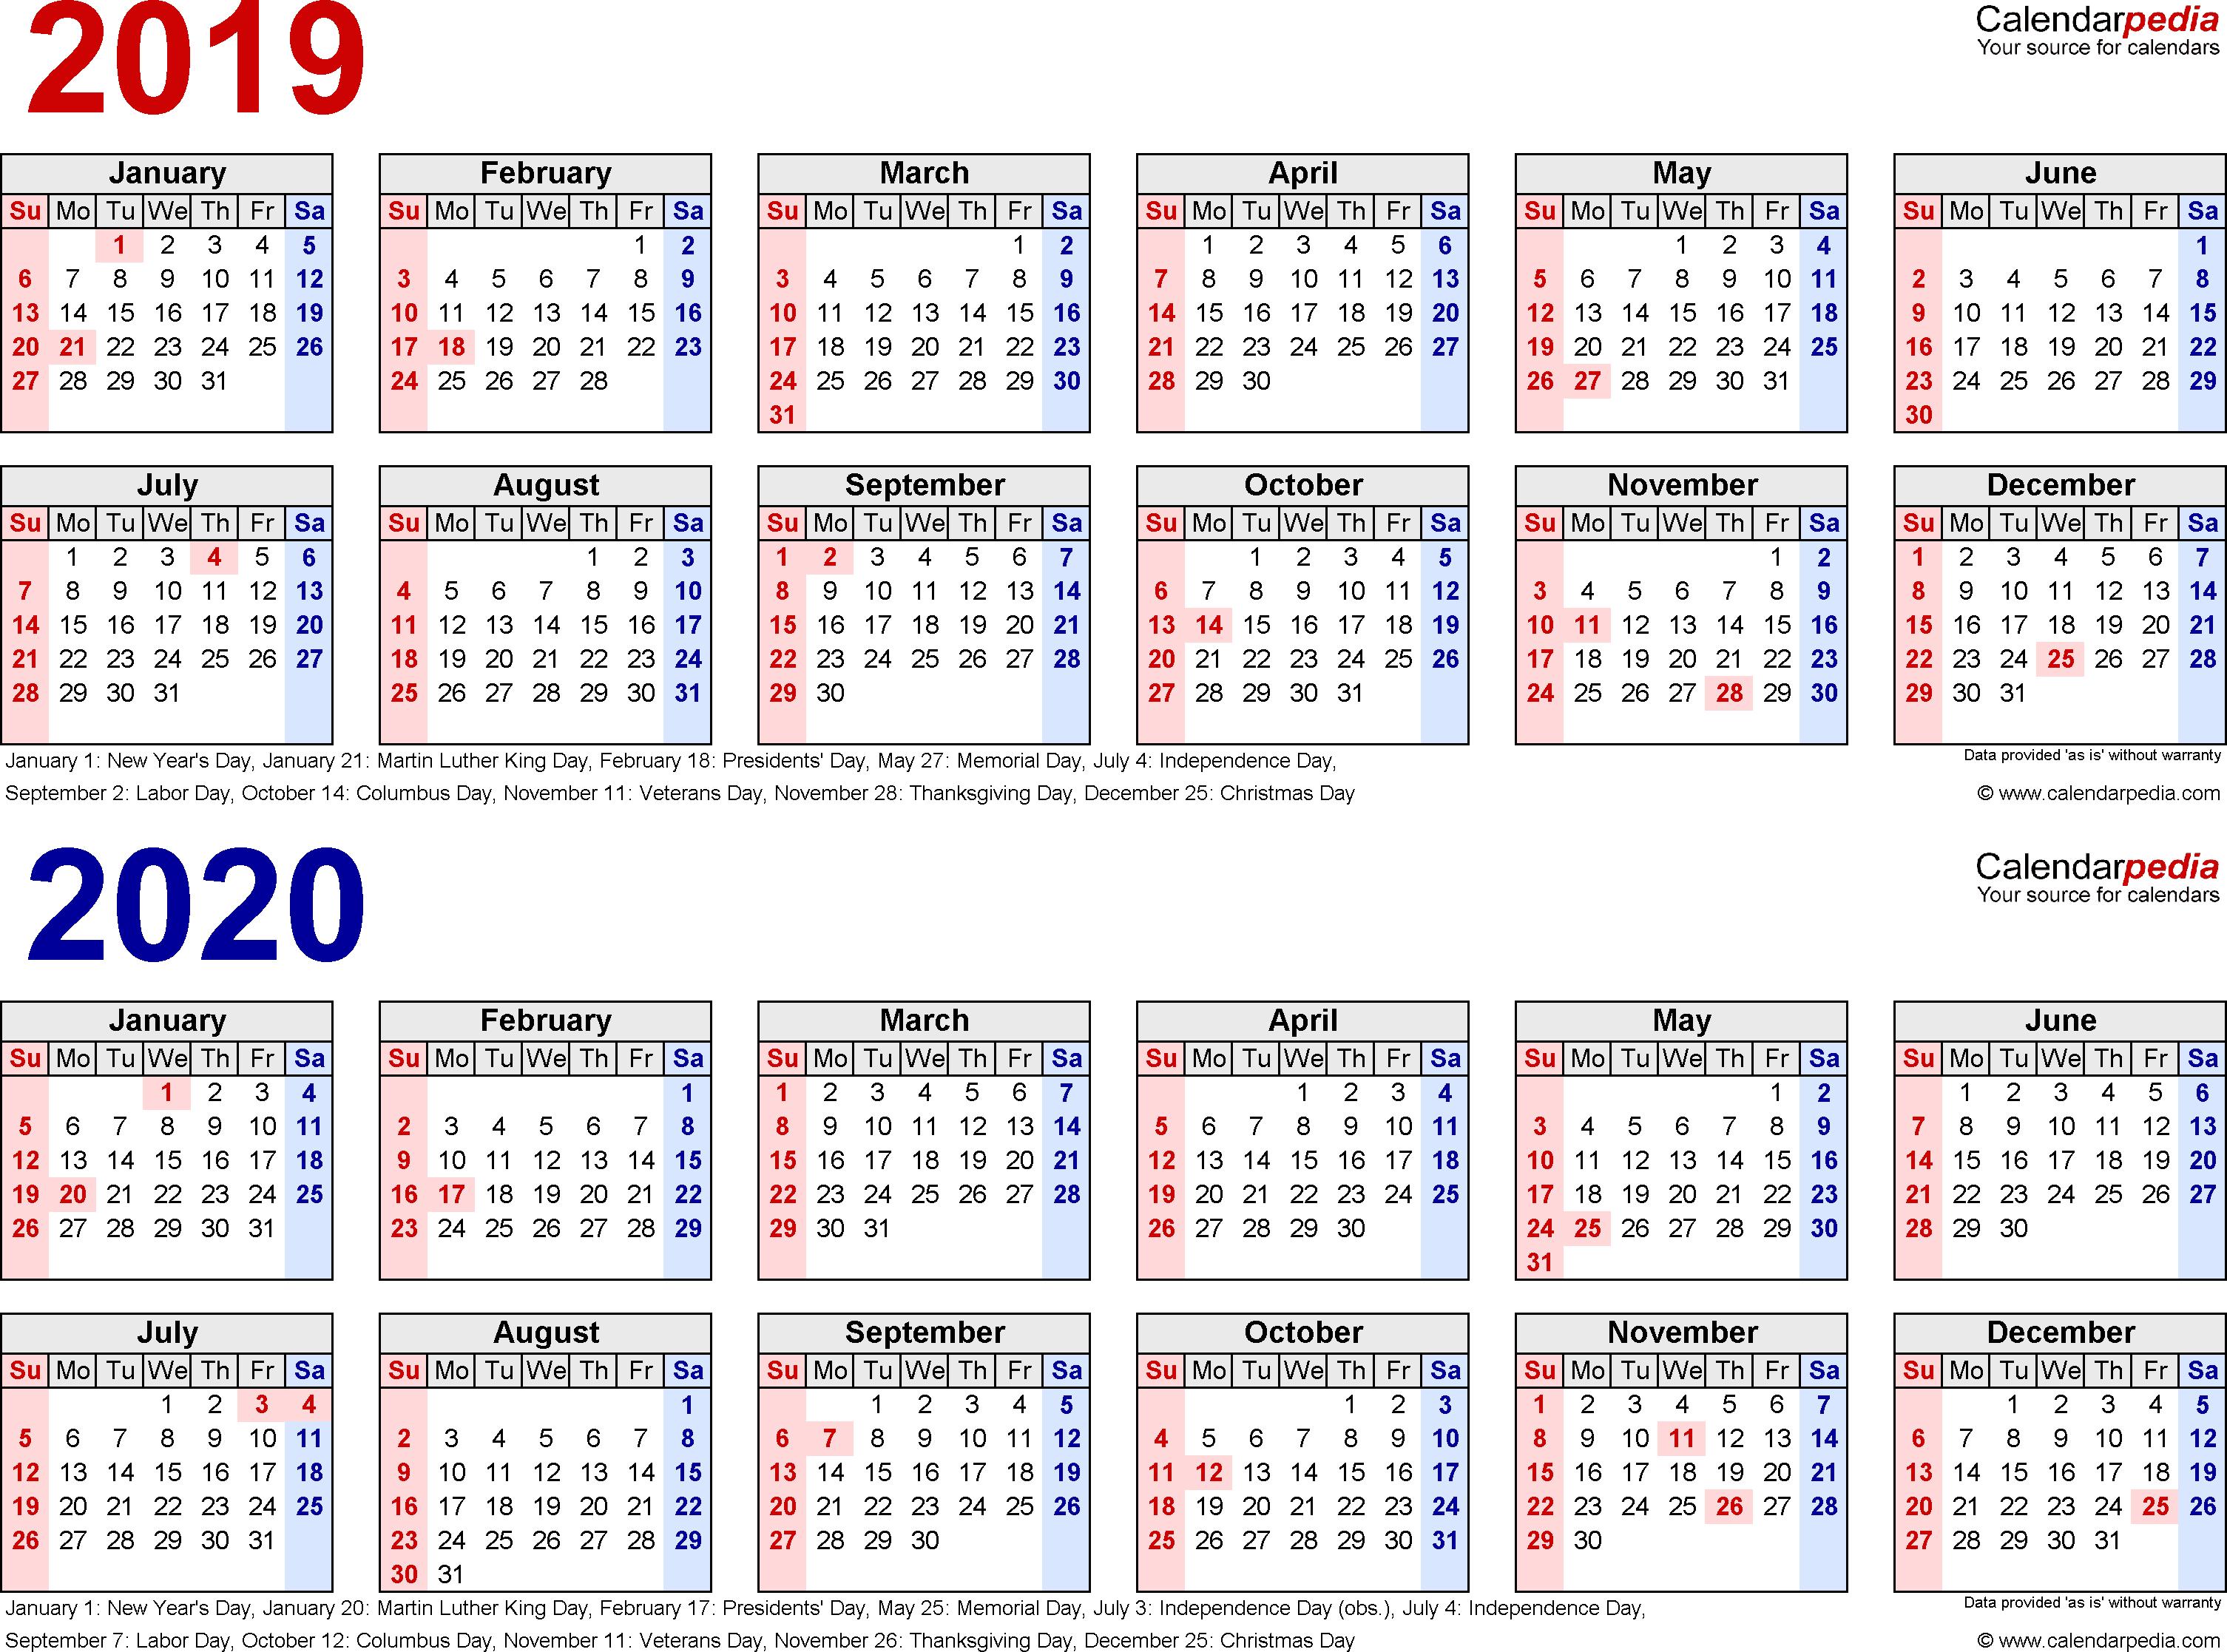 2019-2020 Calendar - Free Printable Two-Year Pdf Calendars throughout Year At A Glance Calendar2019-2020 Free Printable